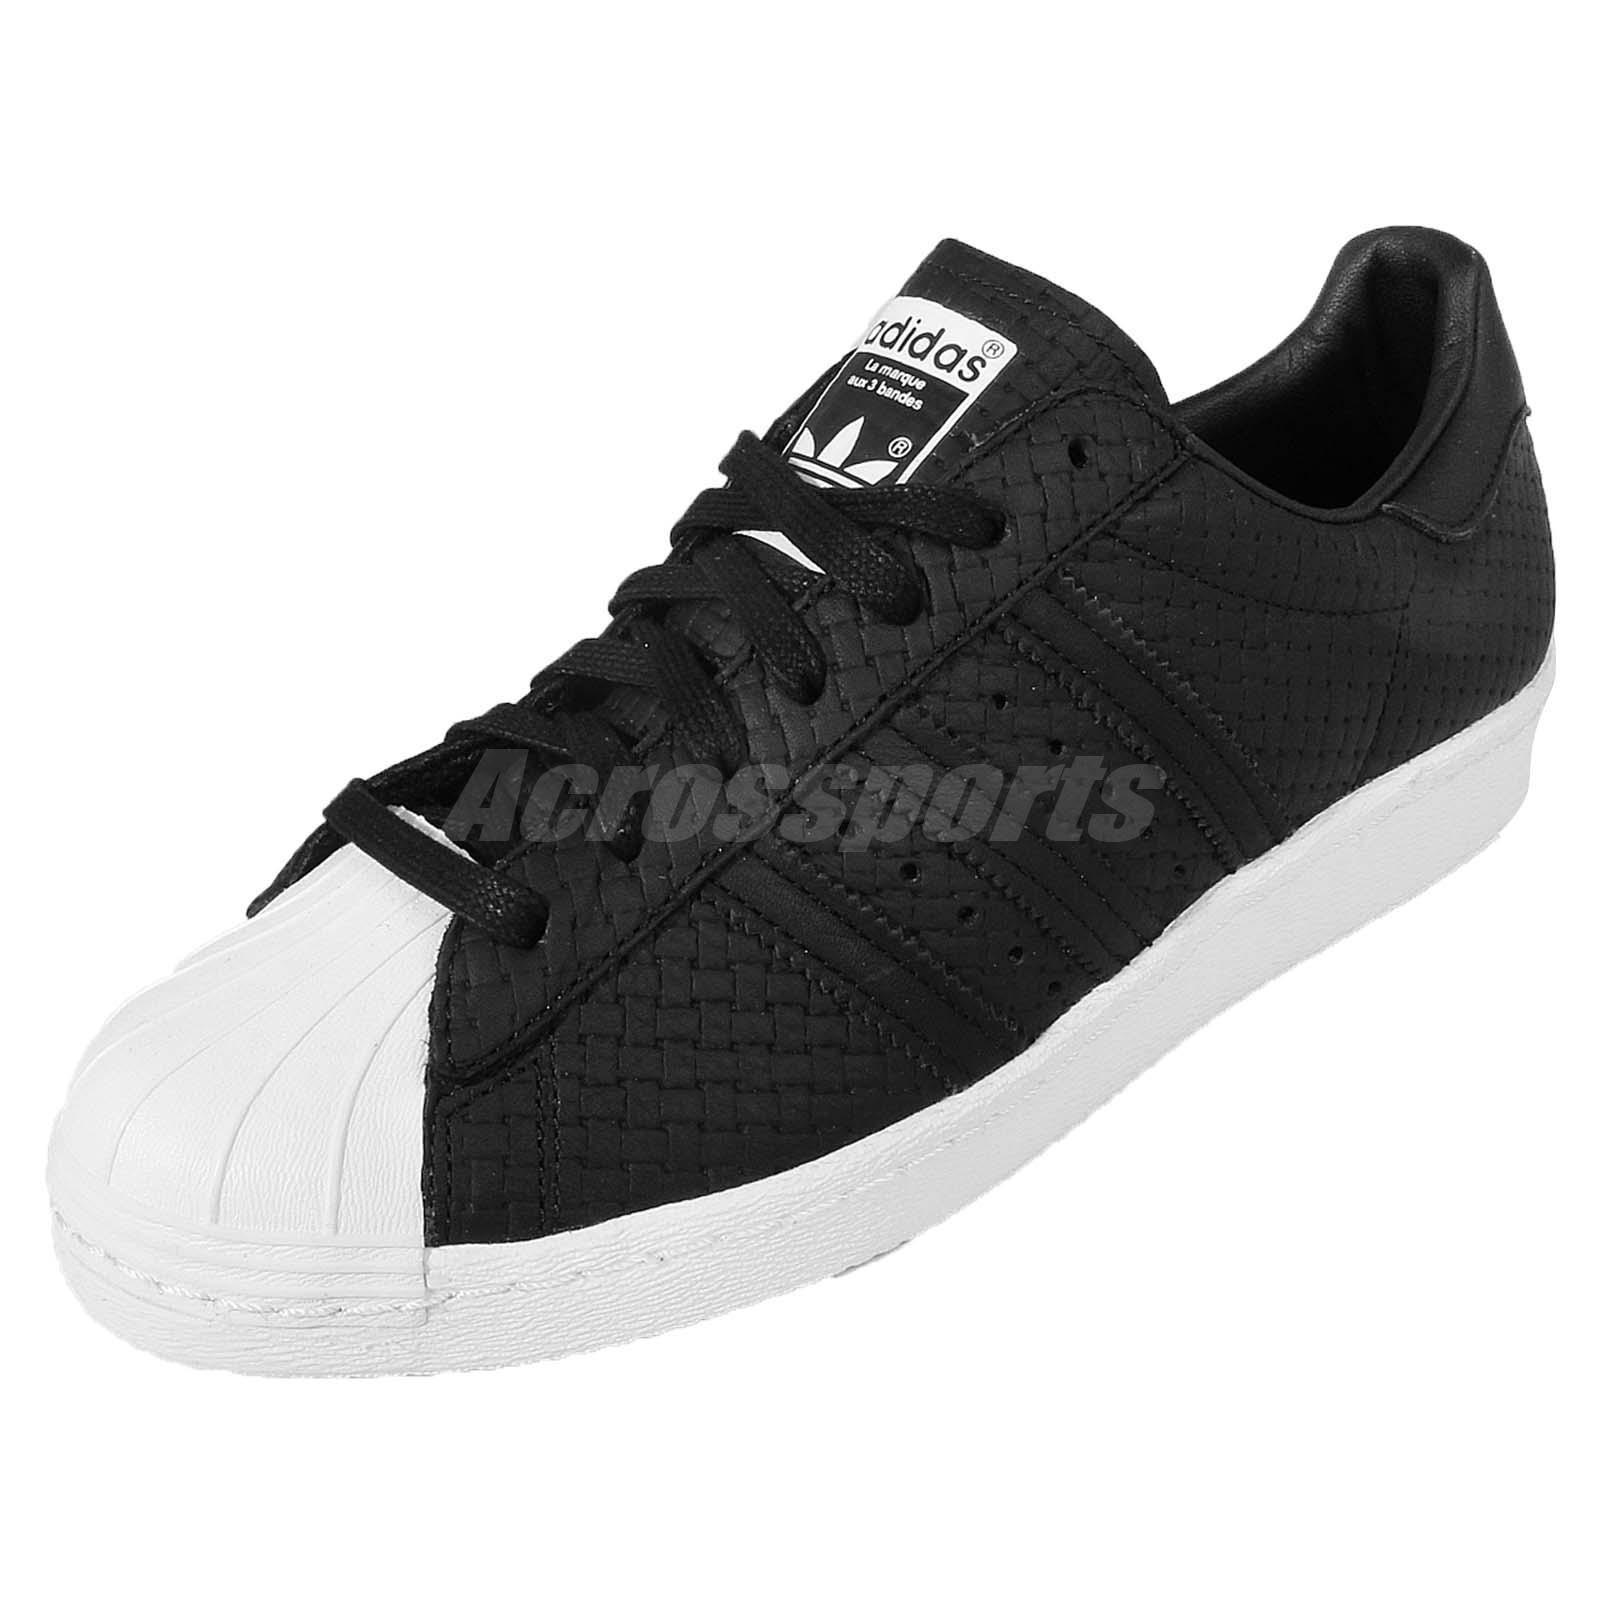 adidas originals superstar 80s men Black